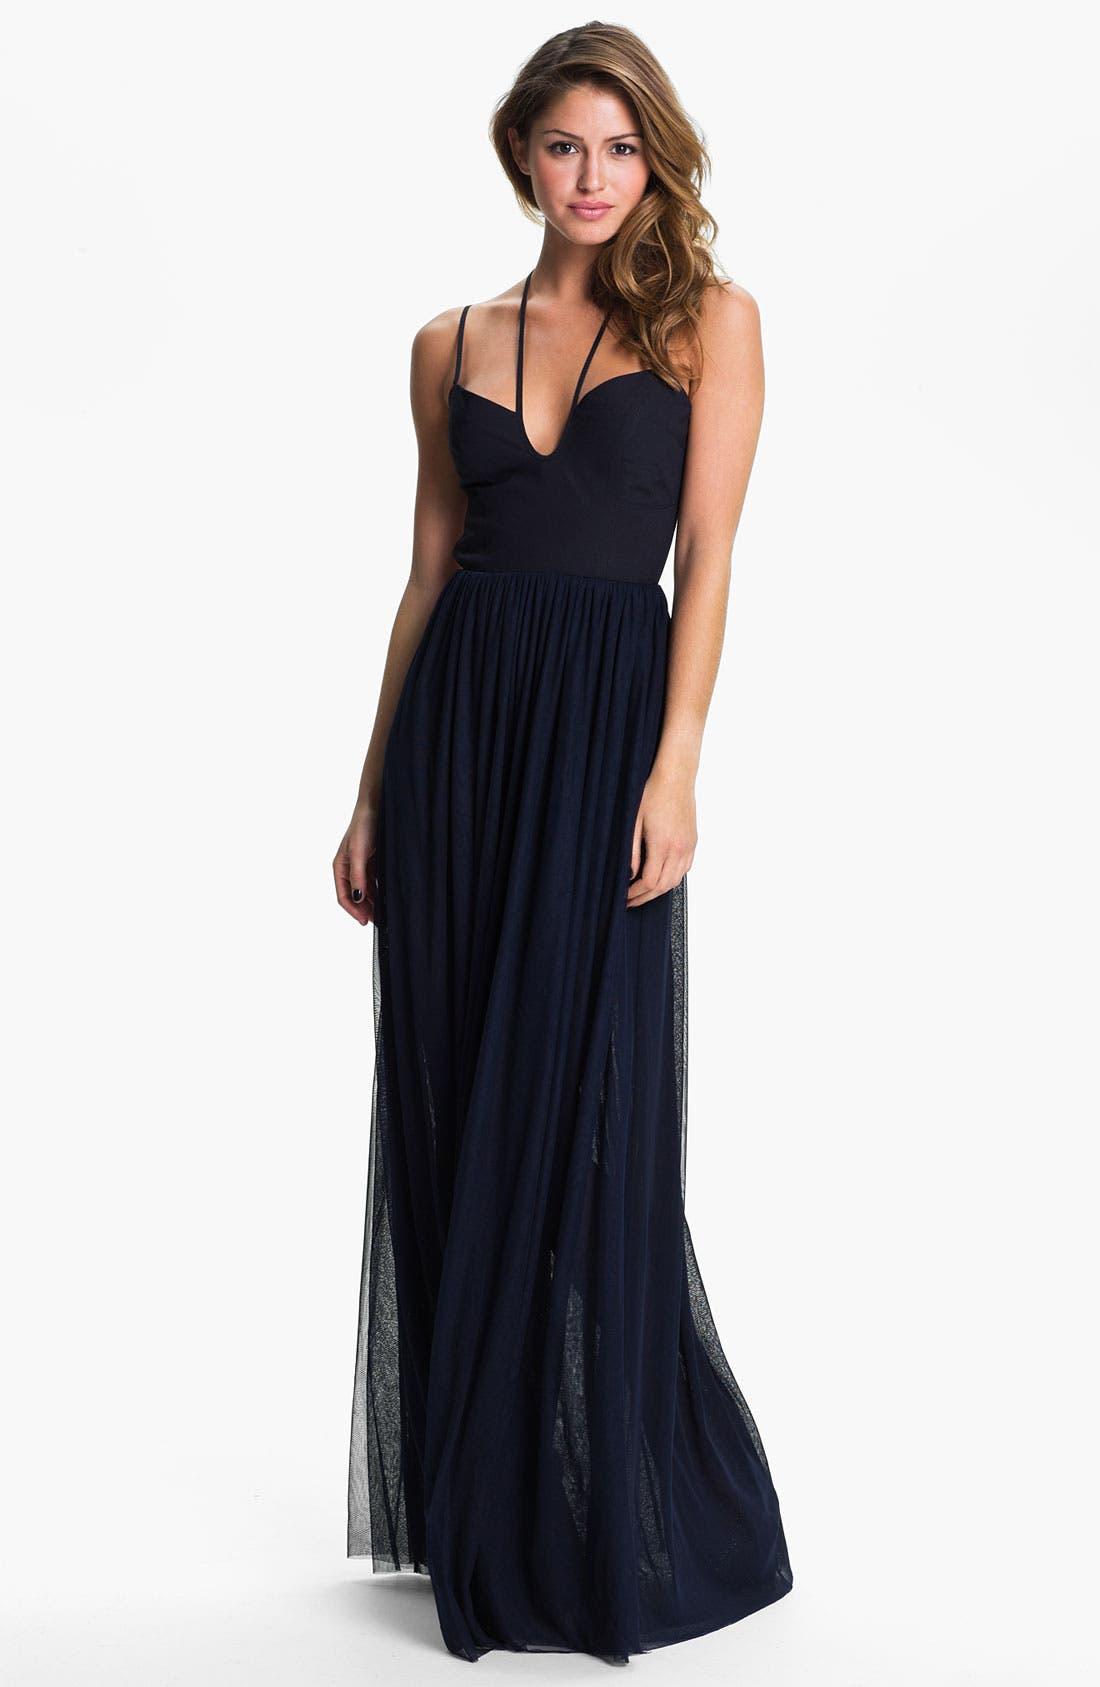 Main Image - Keepsake the Label 'Smoke & Mirrors' Back Cutout Mesh Maxi Dress